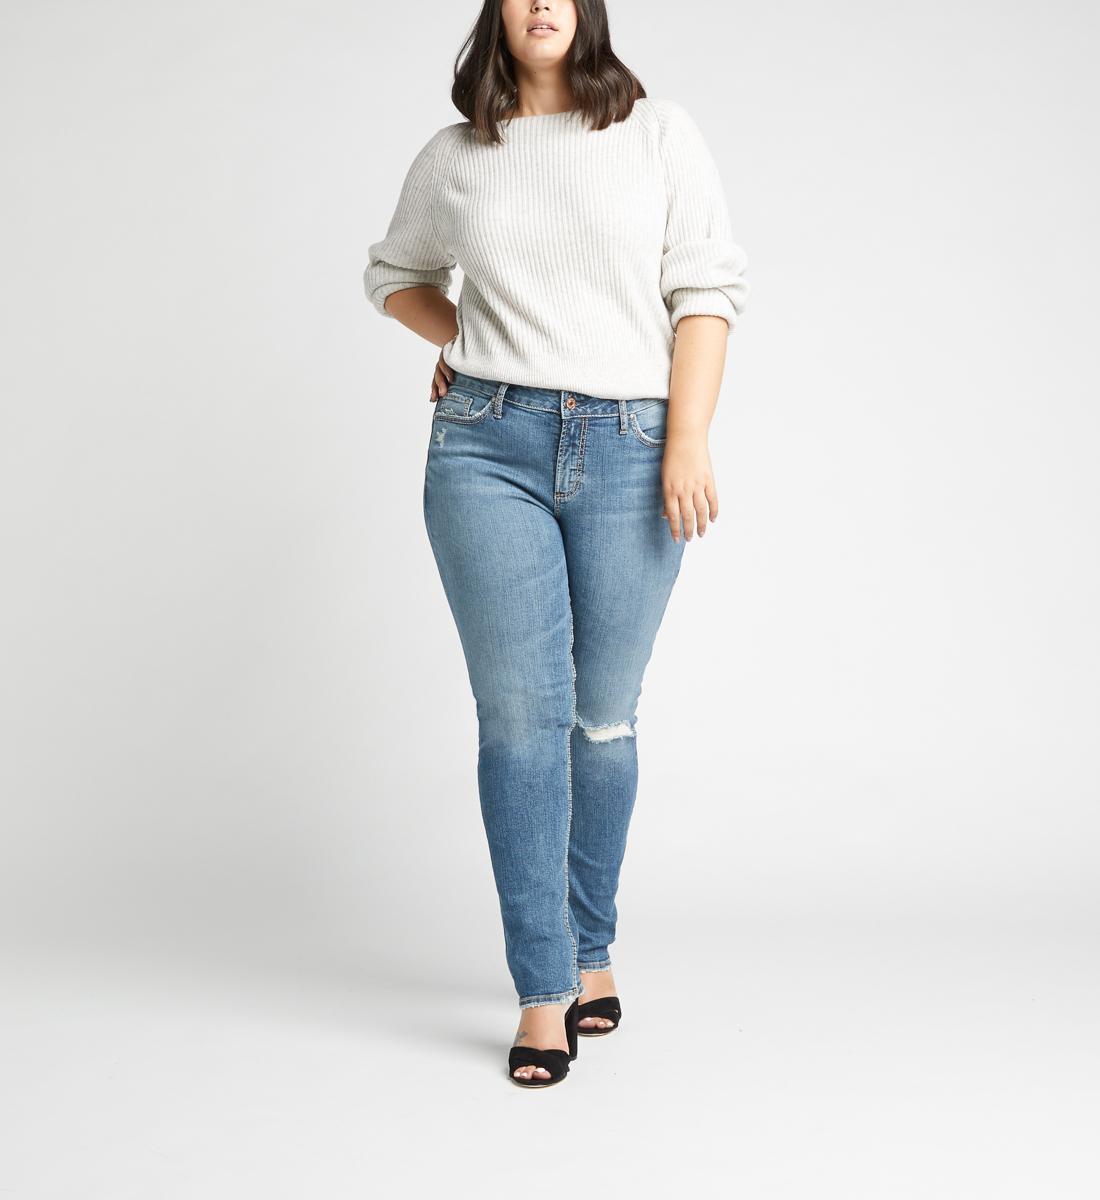 Silver Jeans Avery High Rise Slim Leg Jeans Plus Size